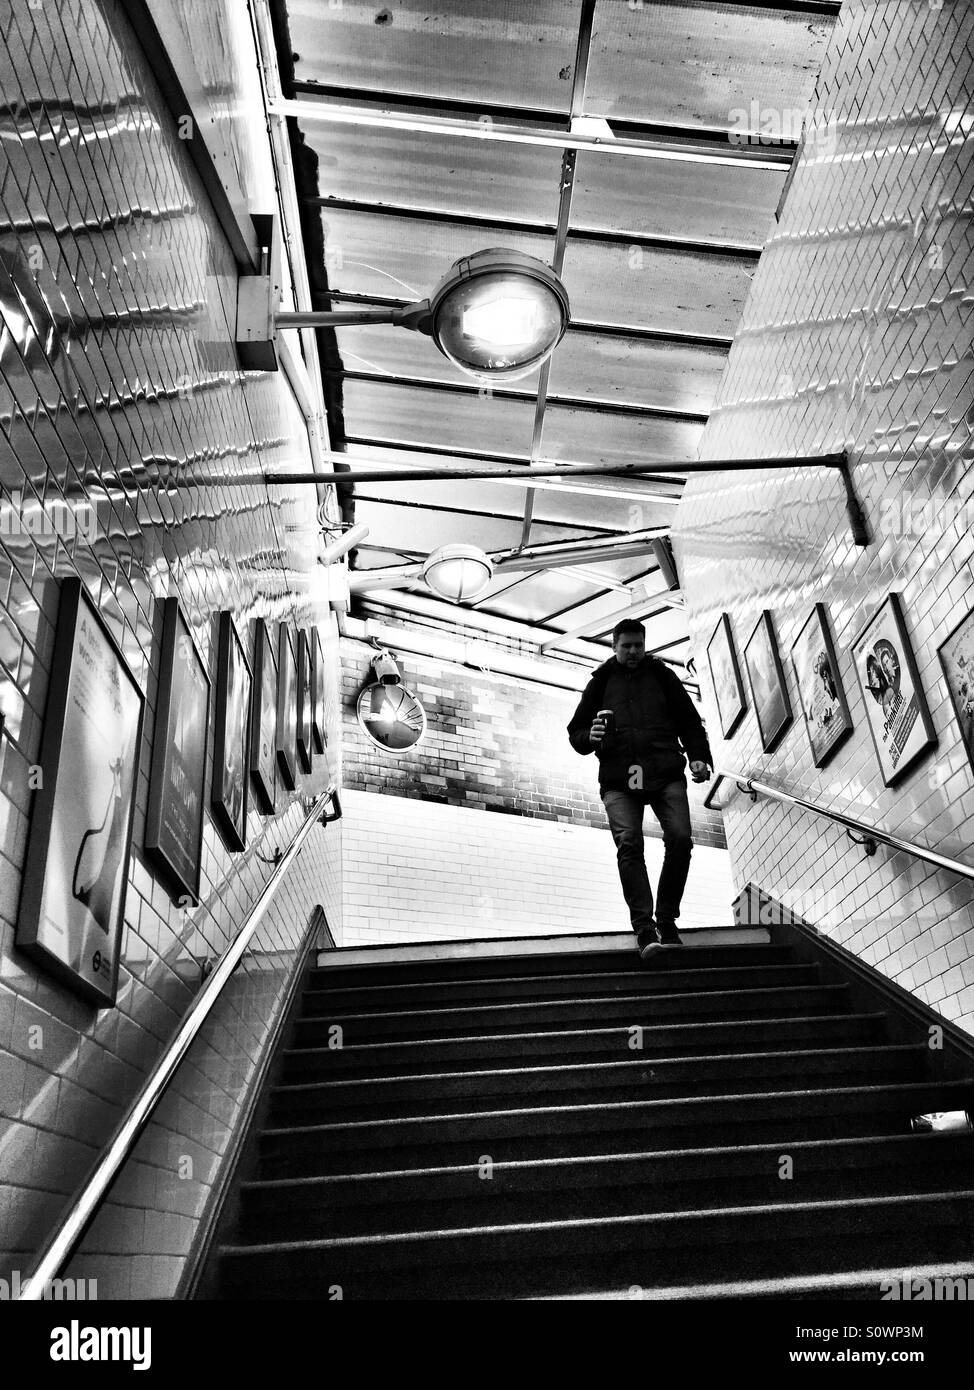 Man on steps. Zigzag shapes - Stock Image